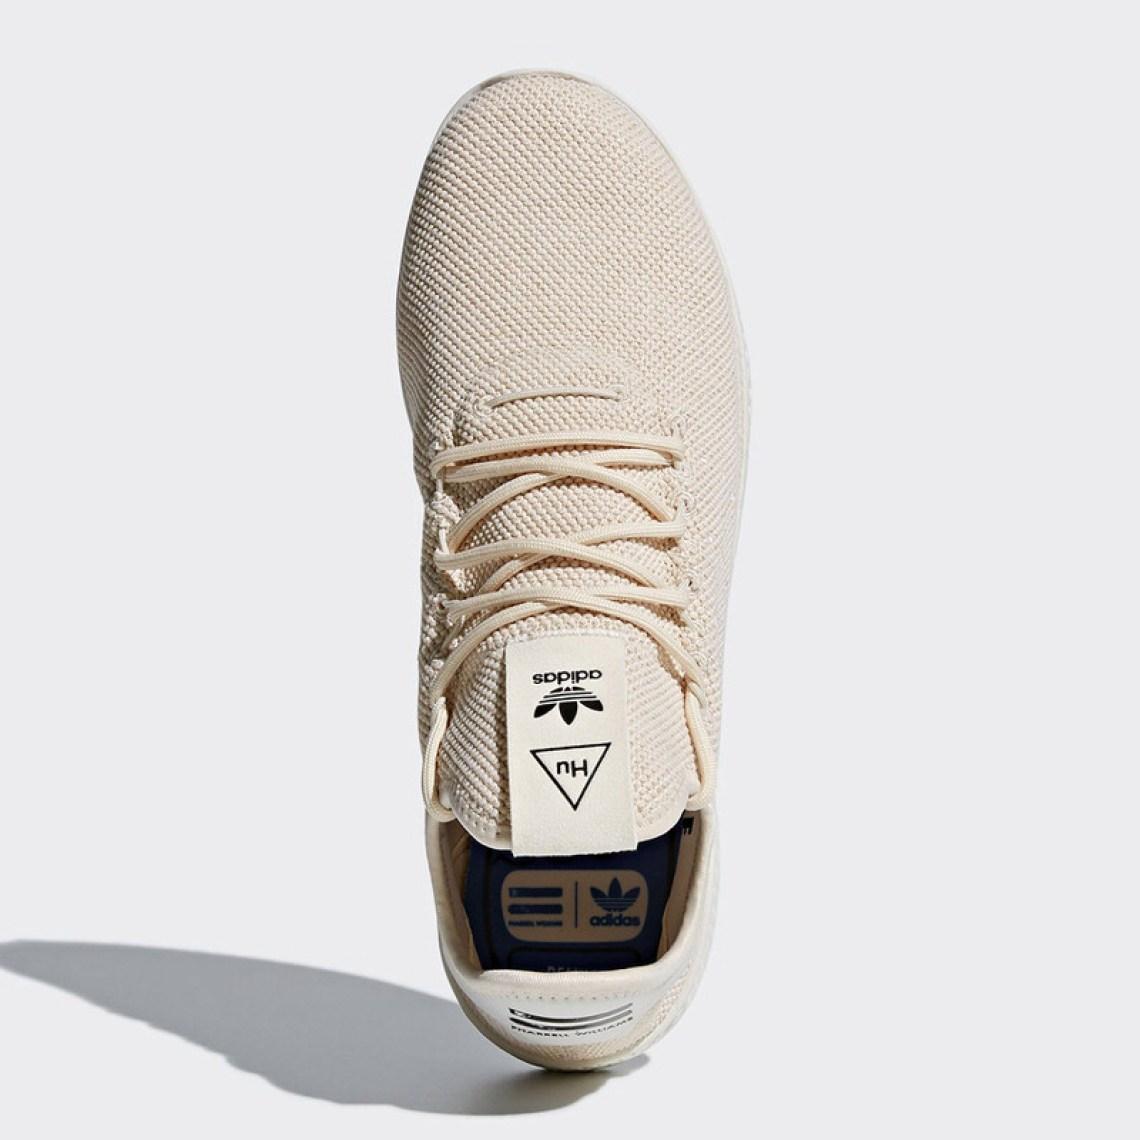 5c8e67883dde Pharrell x adidas Tennis Hu